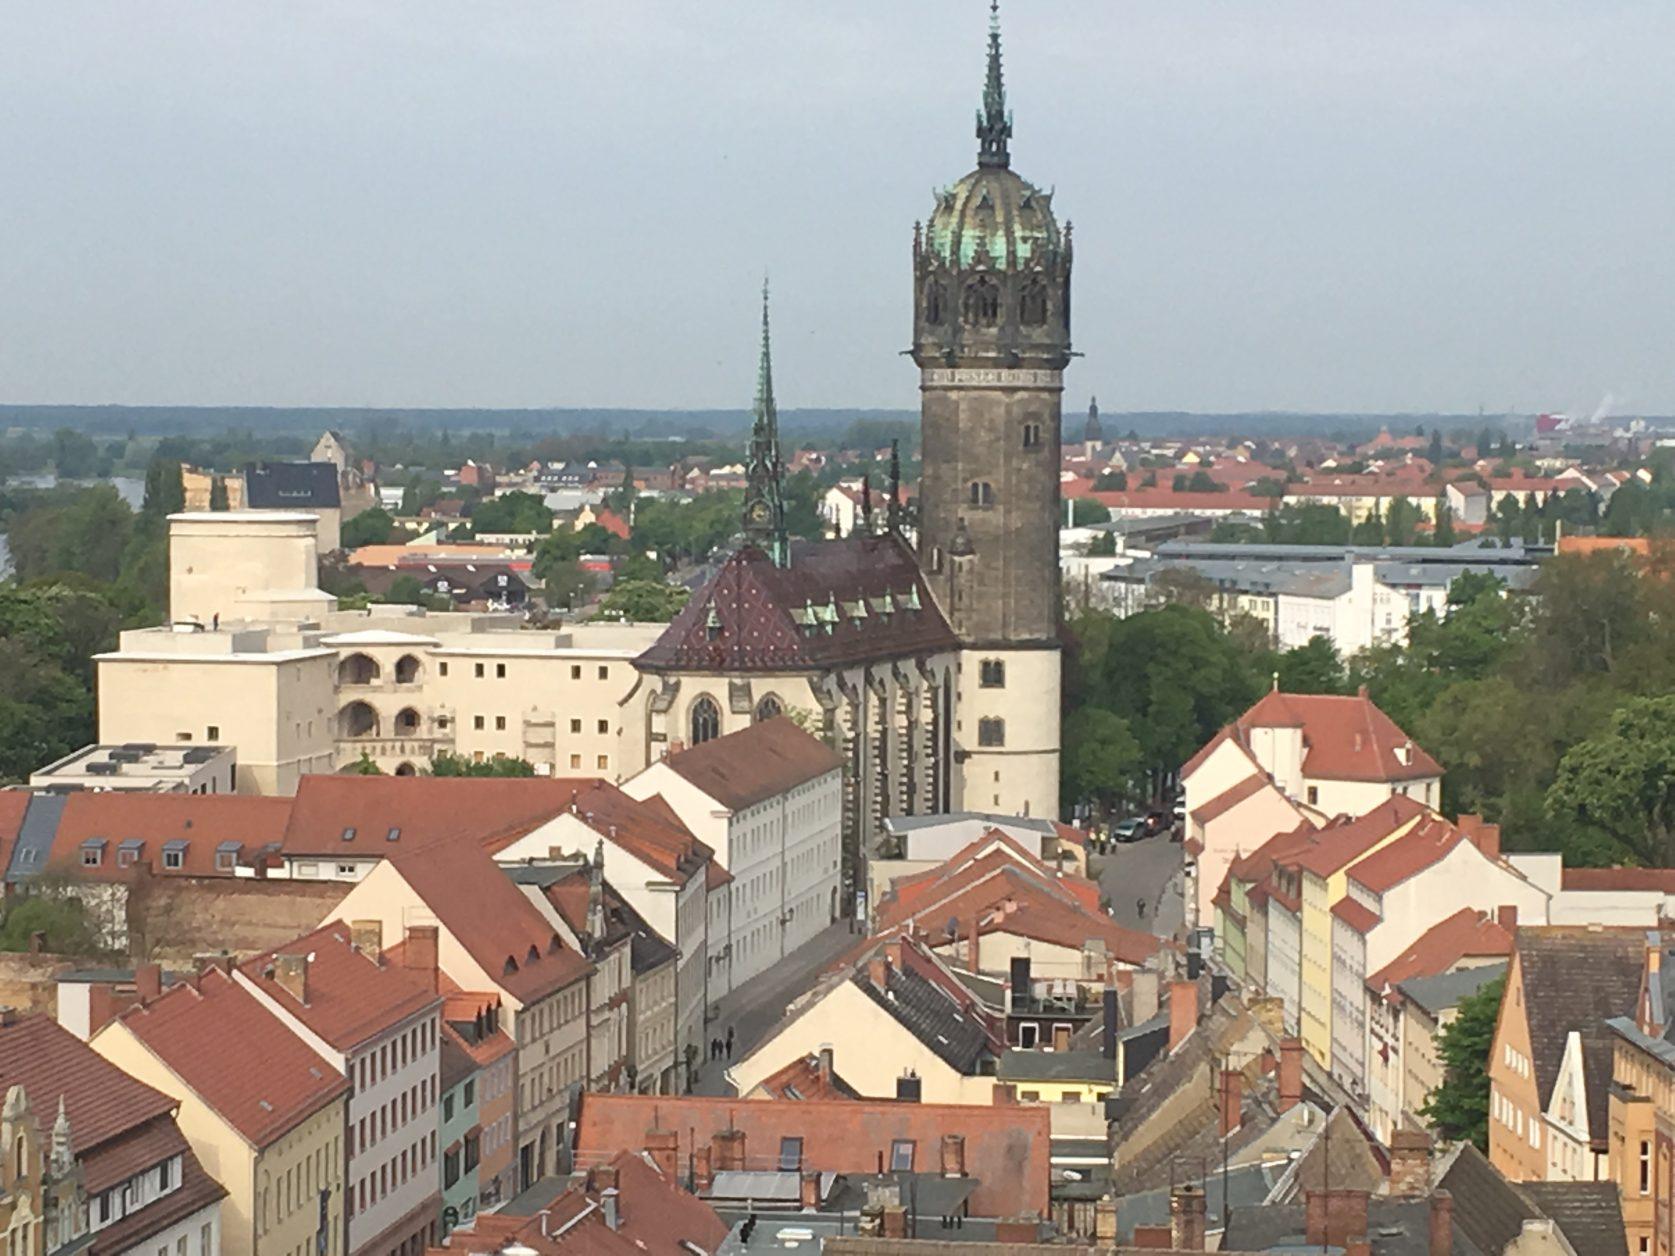 Blick auf Wittenbergs Schlosskirche, Foto: Weirauch